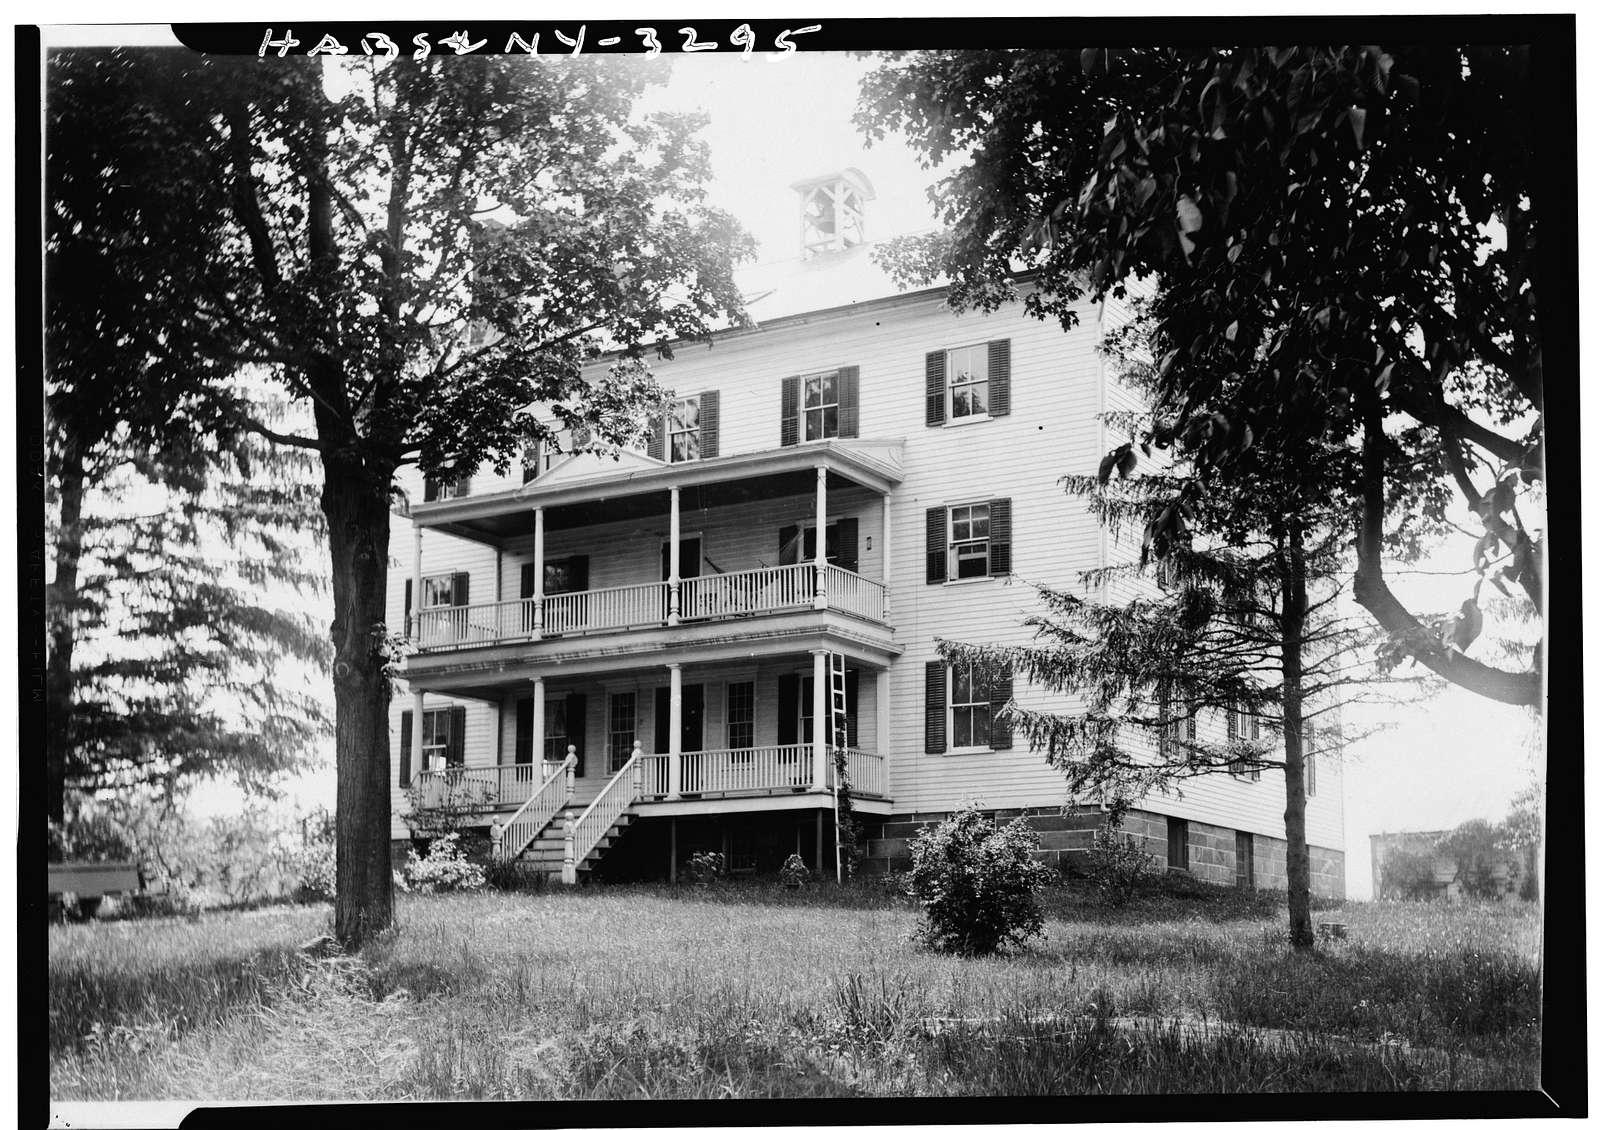 Shaker North Family Dwelling House, Albany Shaker Road, Colonie Township, Watervliet, Albany County, NY